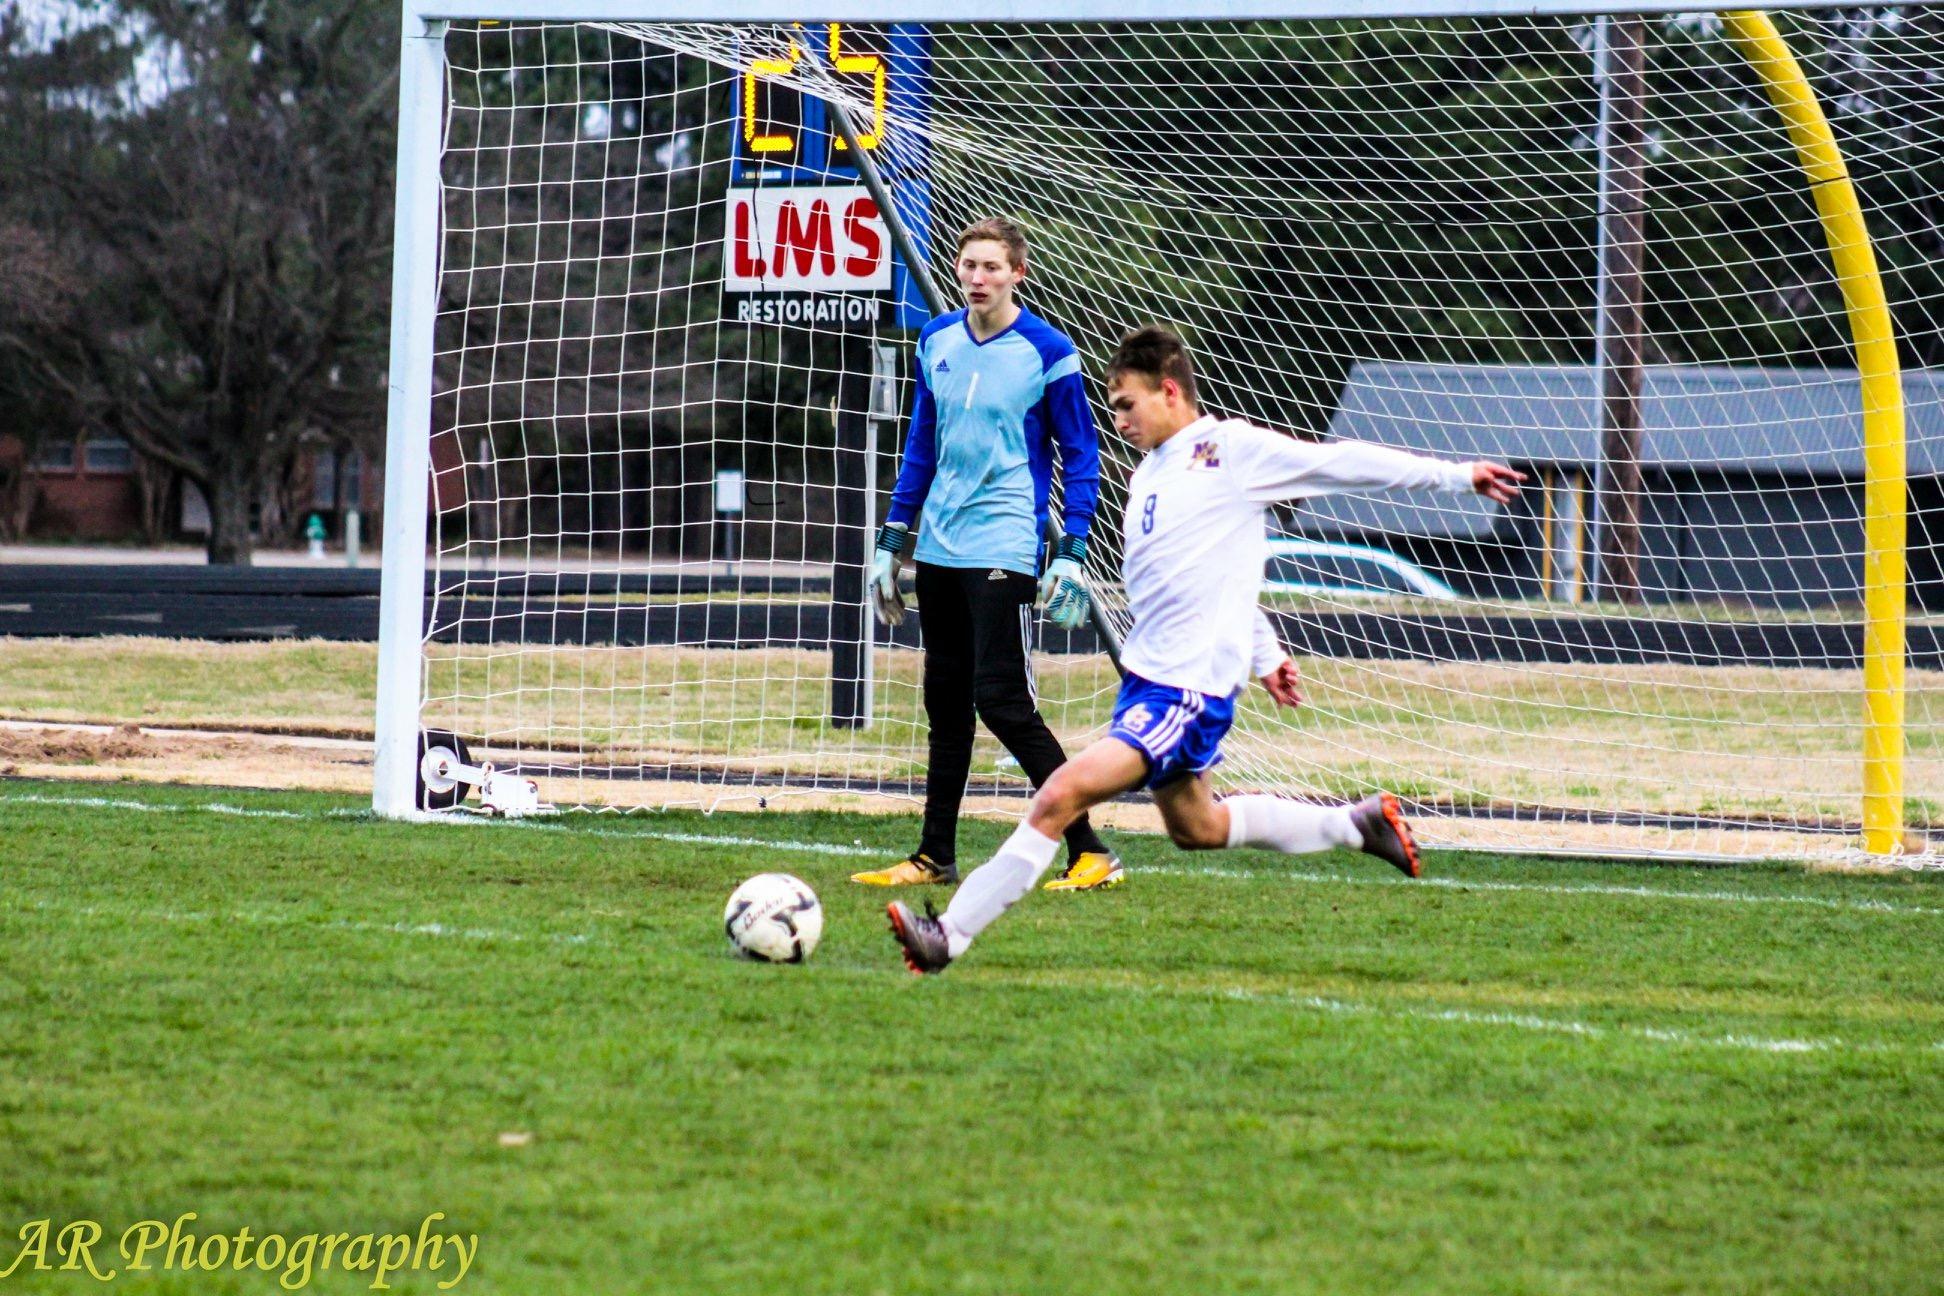 Aaron Meredith with a goal kick as Nick Kear looks on